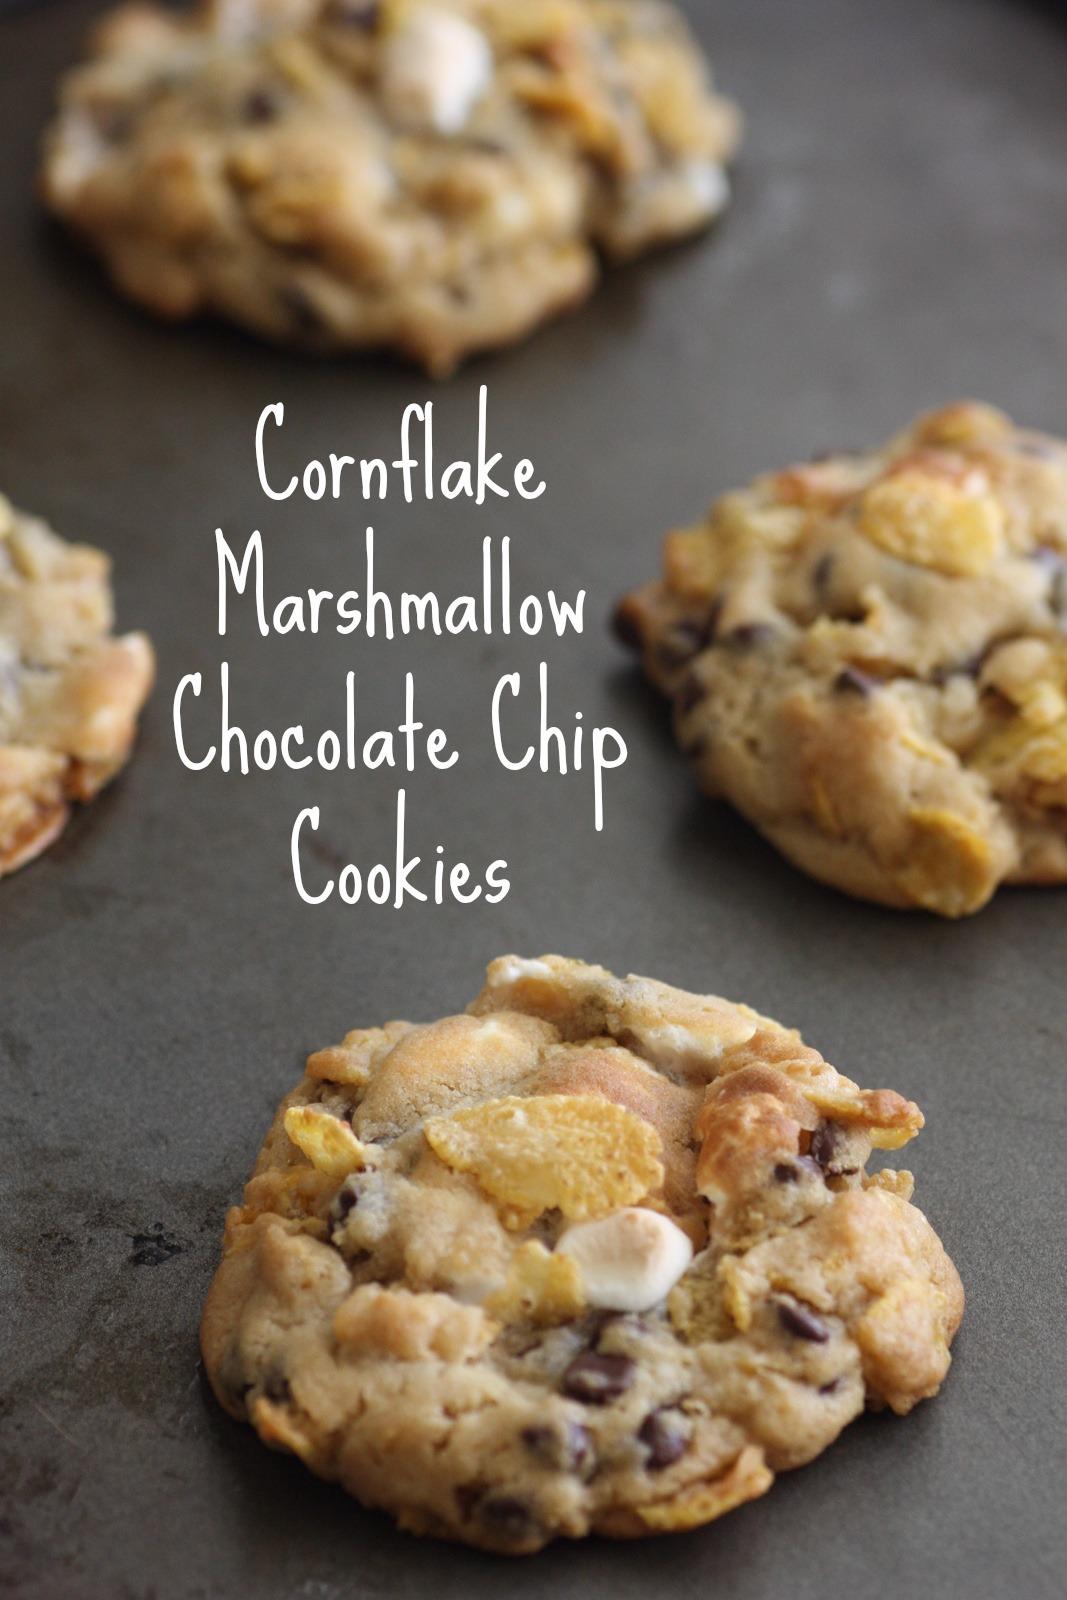 Cornflake Marshmallow Chocolate Chip Cookie Recipe